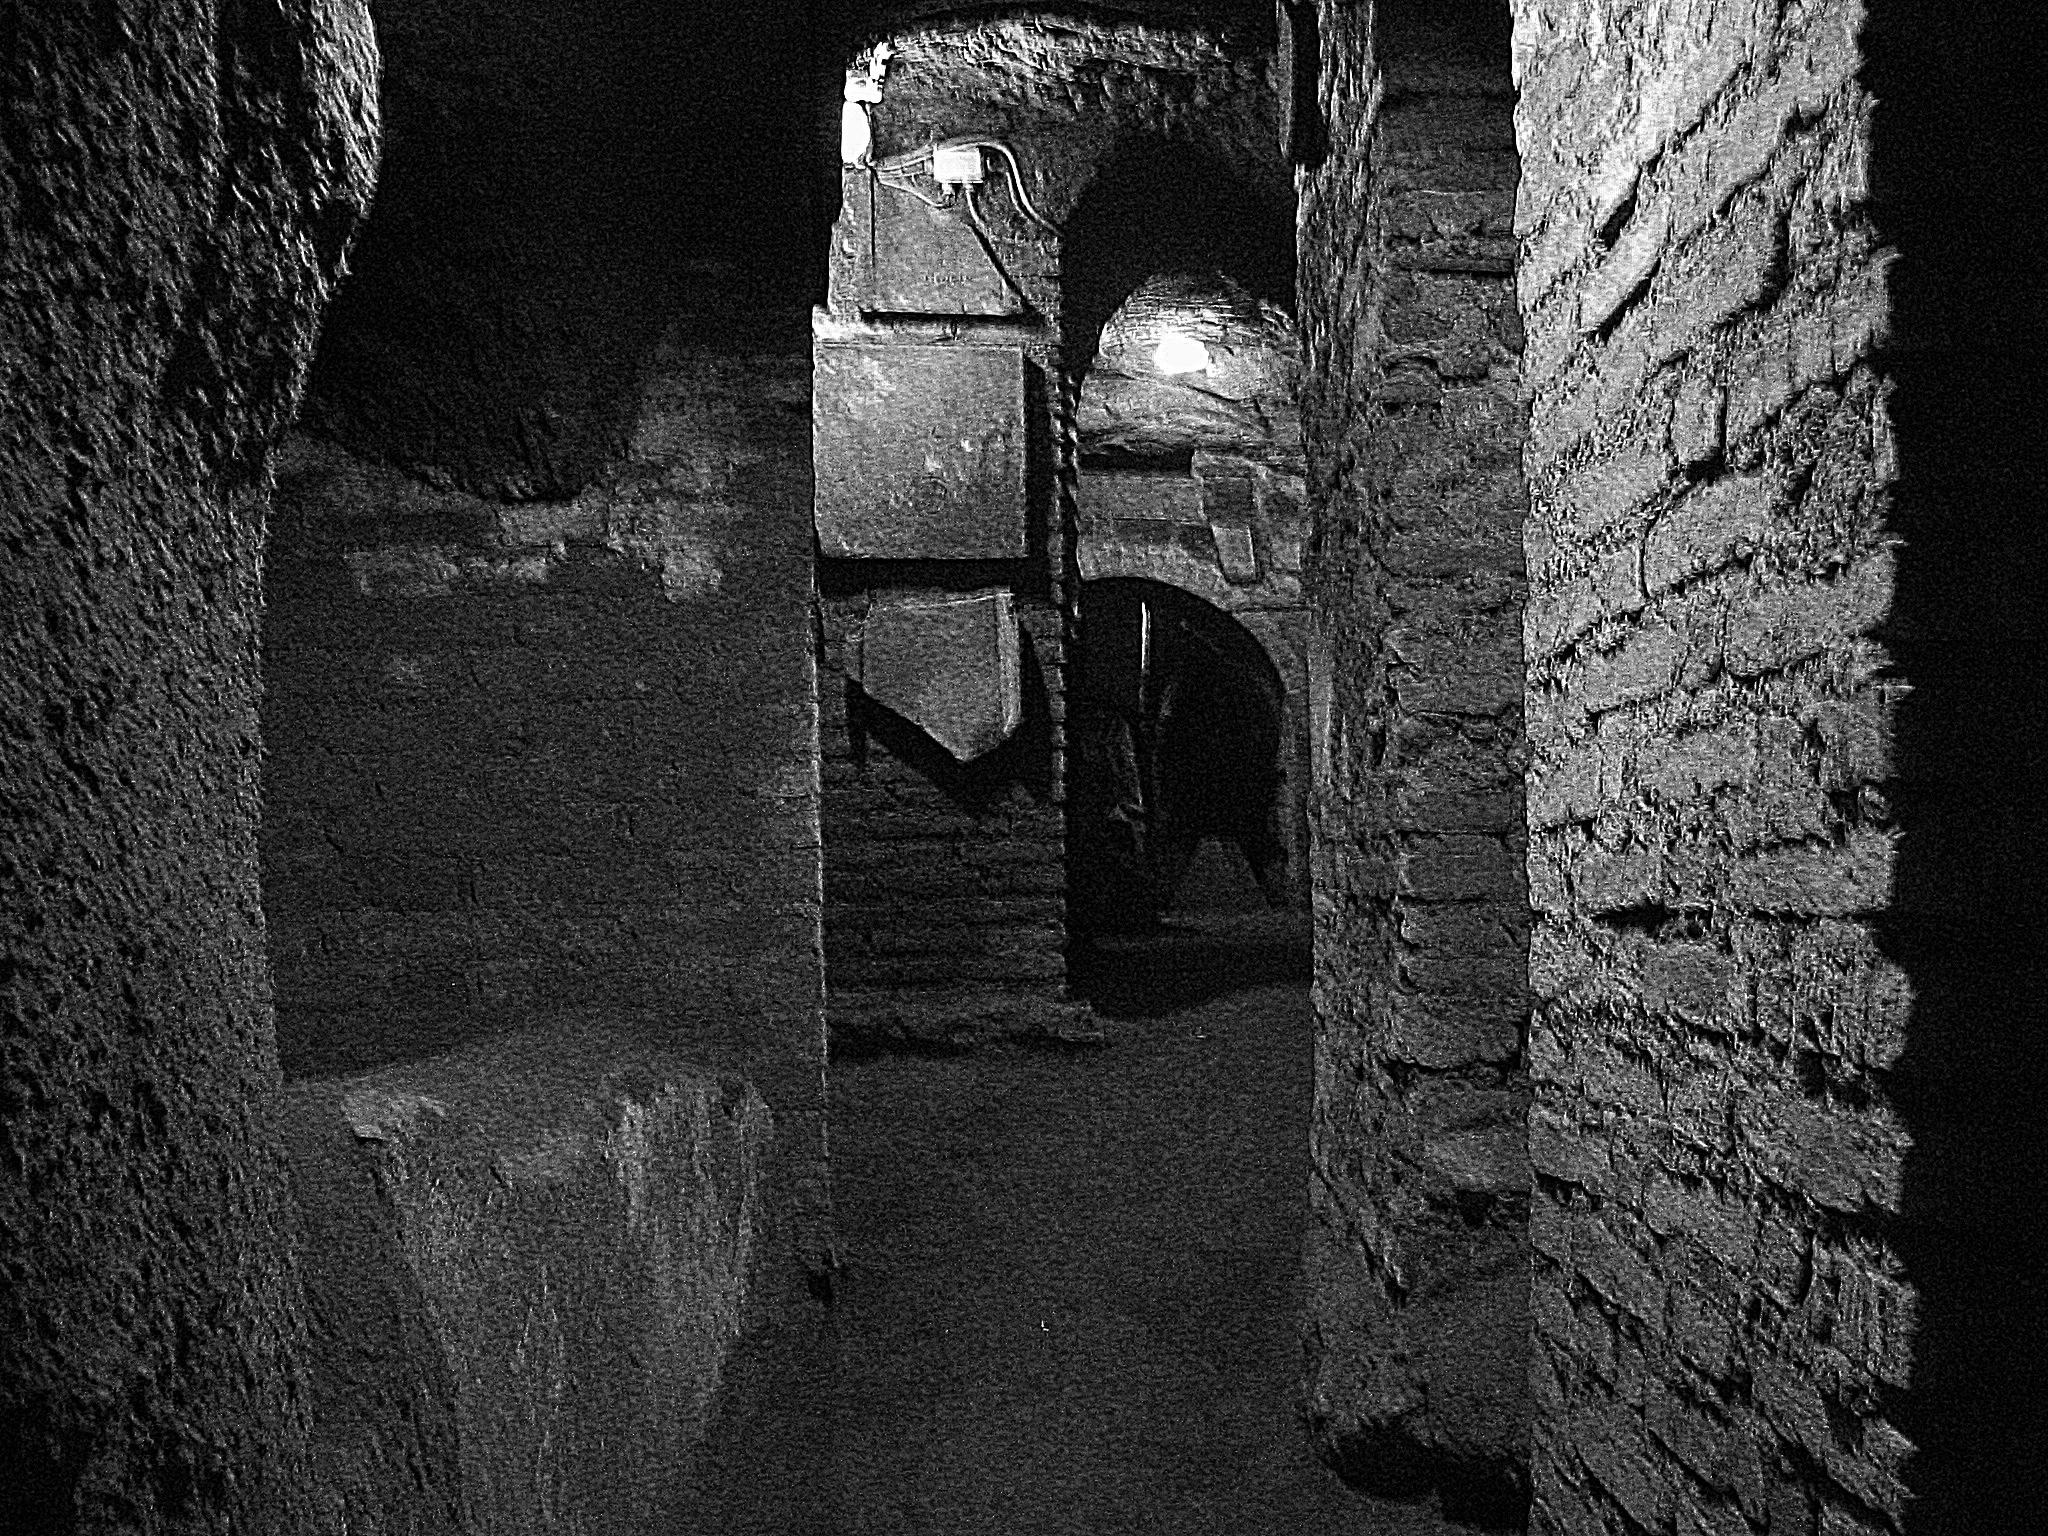 http://upload.wikimedia.org/wikipedia/commons/3/3c/Catacombs_S._Sebastiano_Rome1.jpg